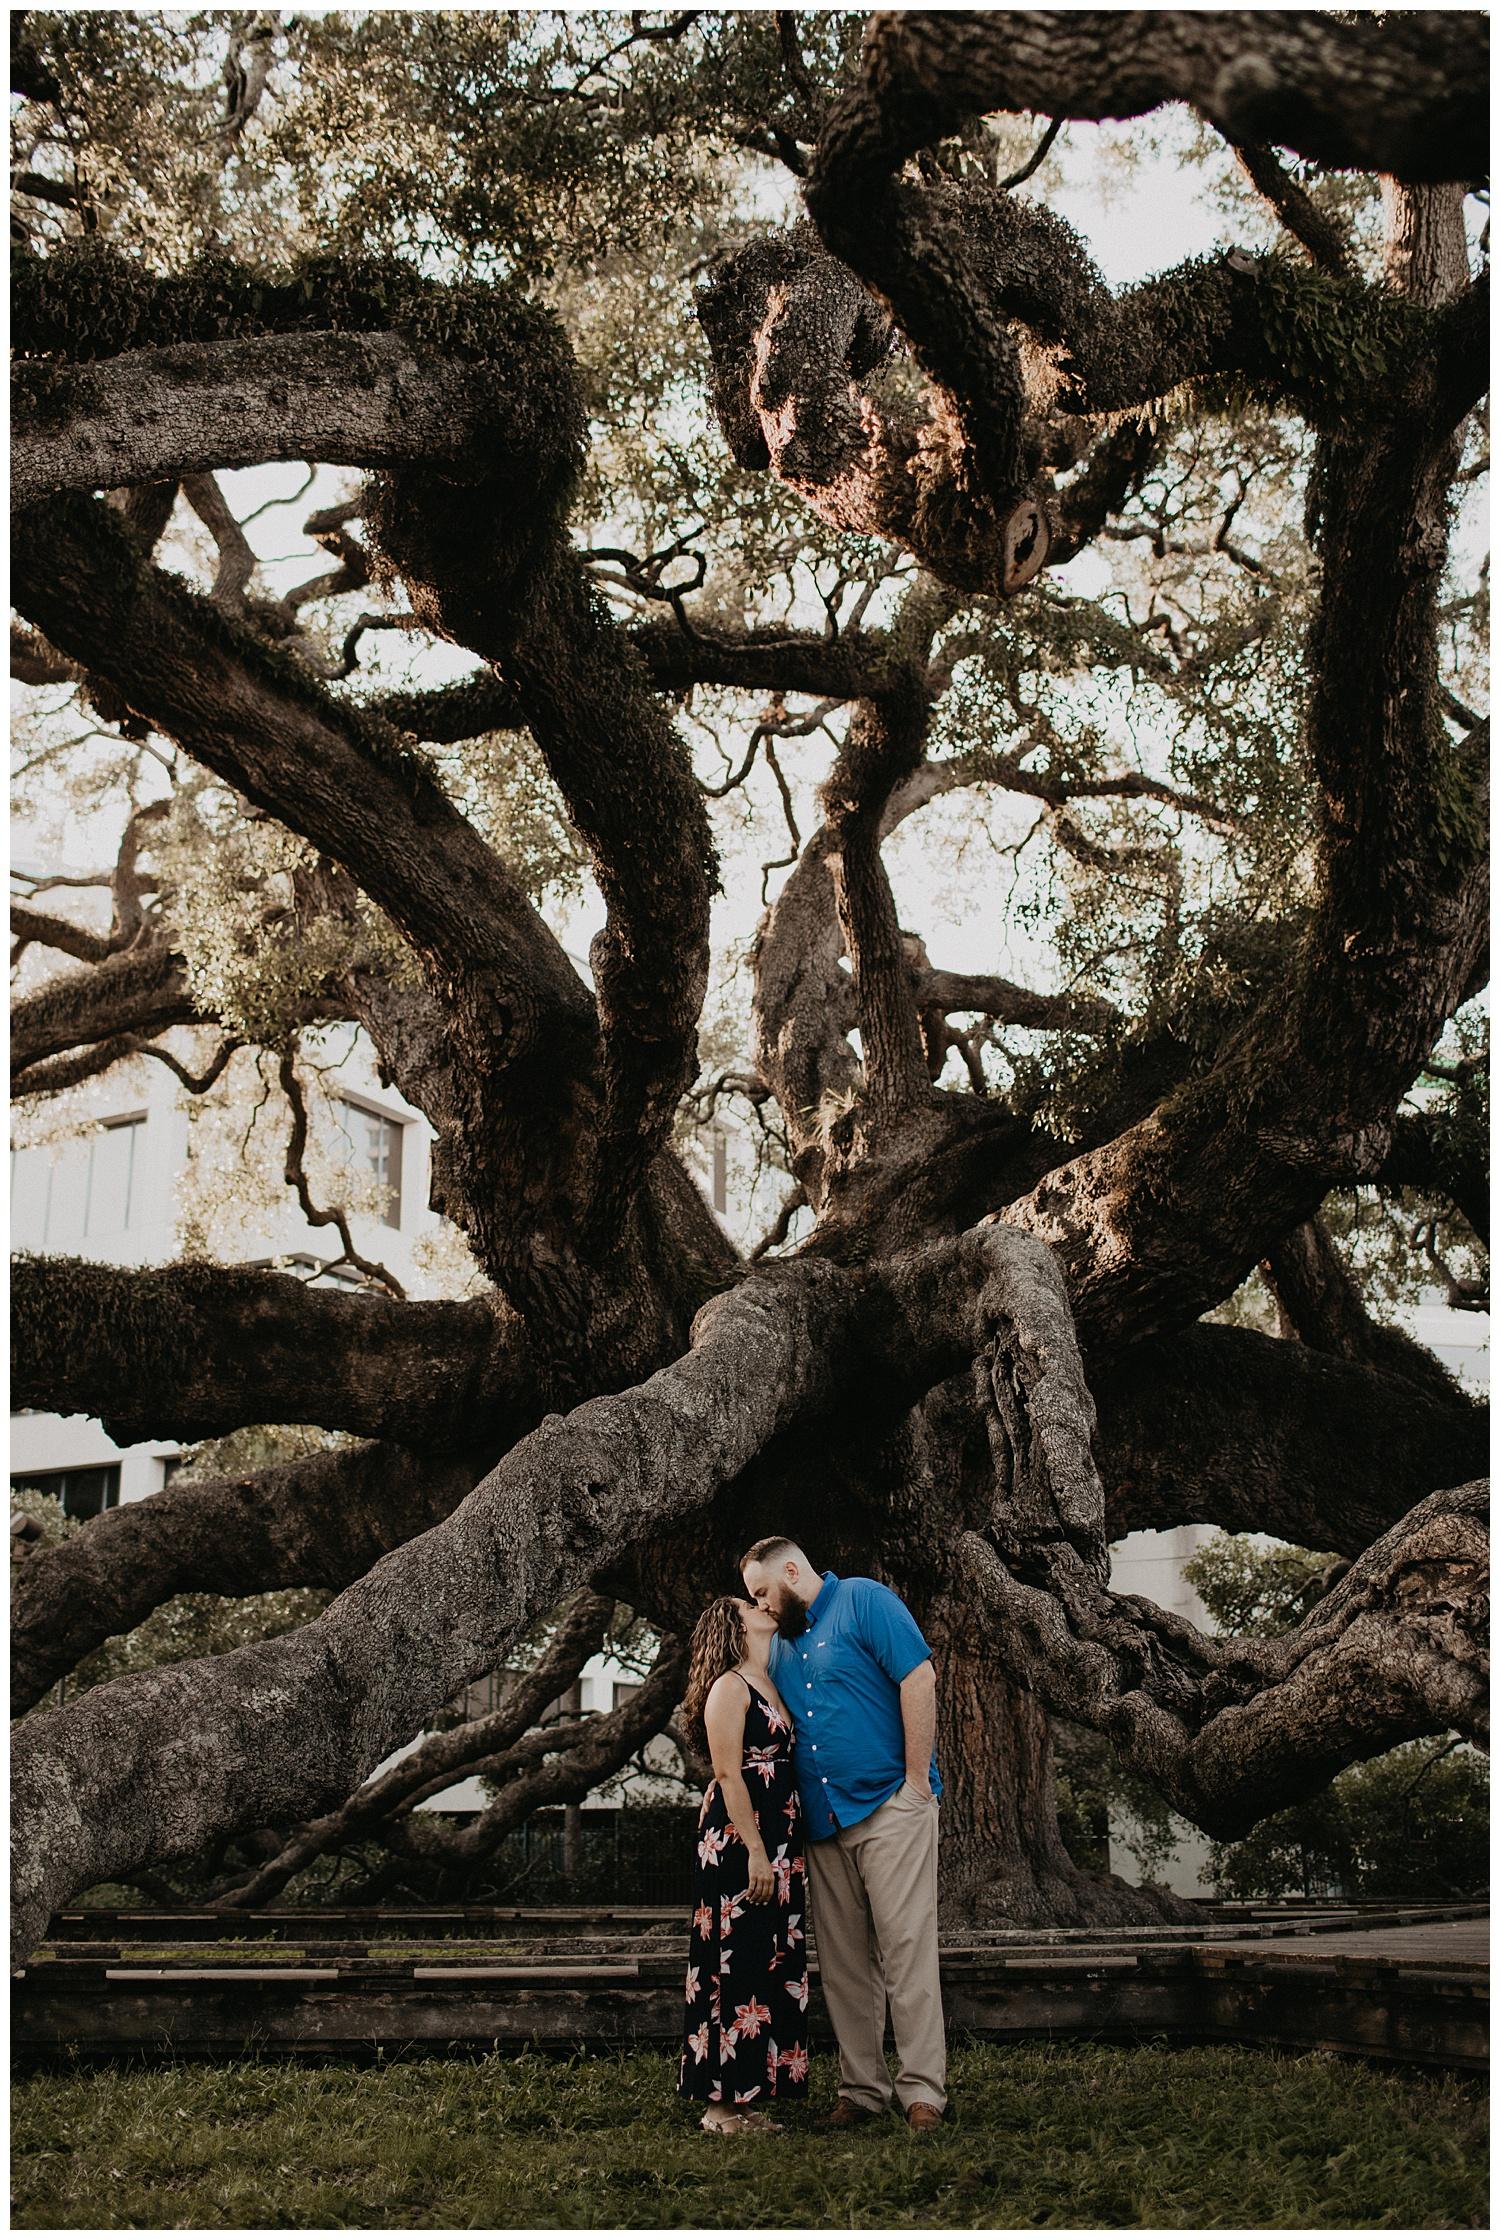 treaty-oak-and-friendship-fountain-engagement-jacksonville-florida_0652.jpg